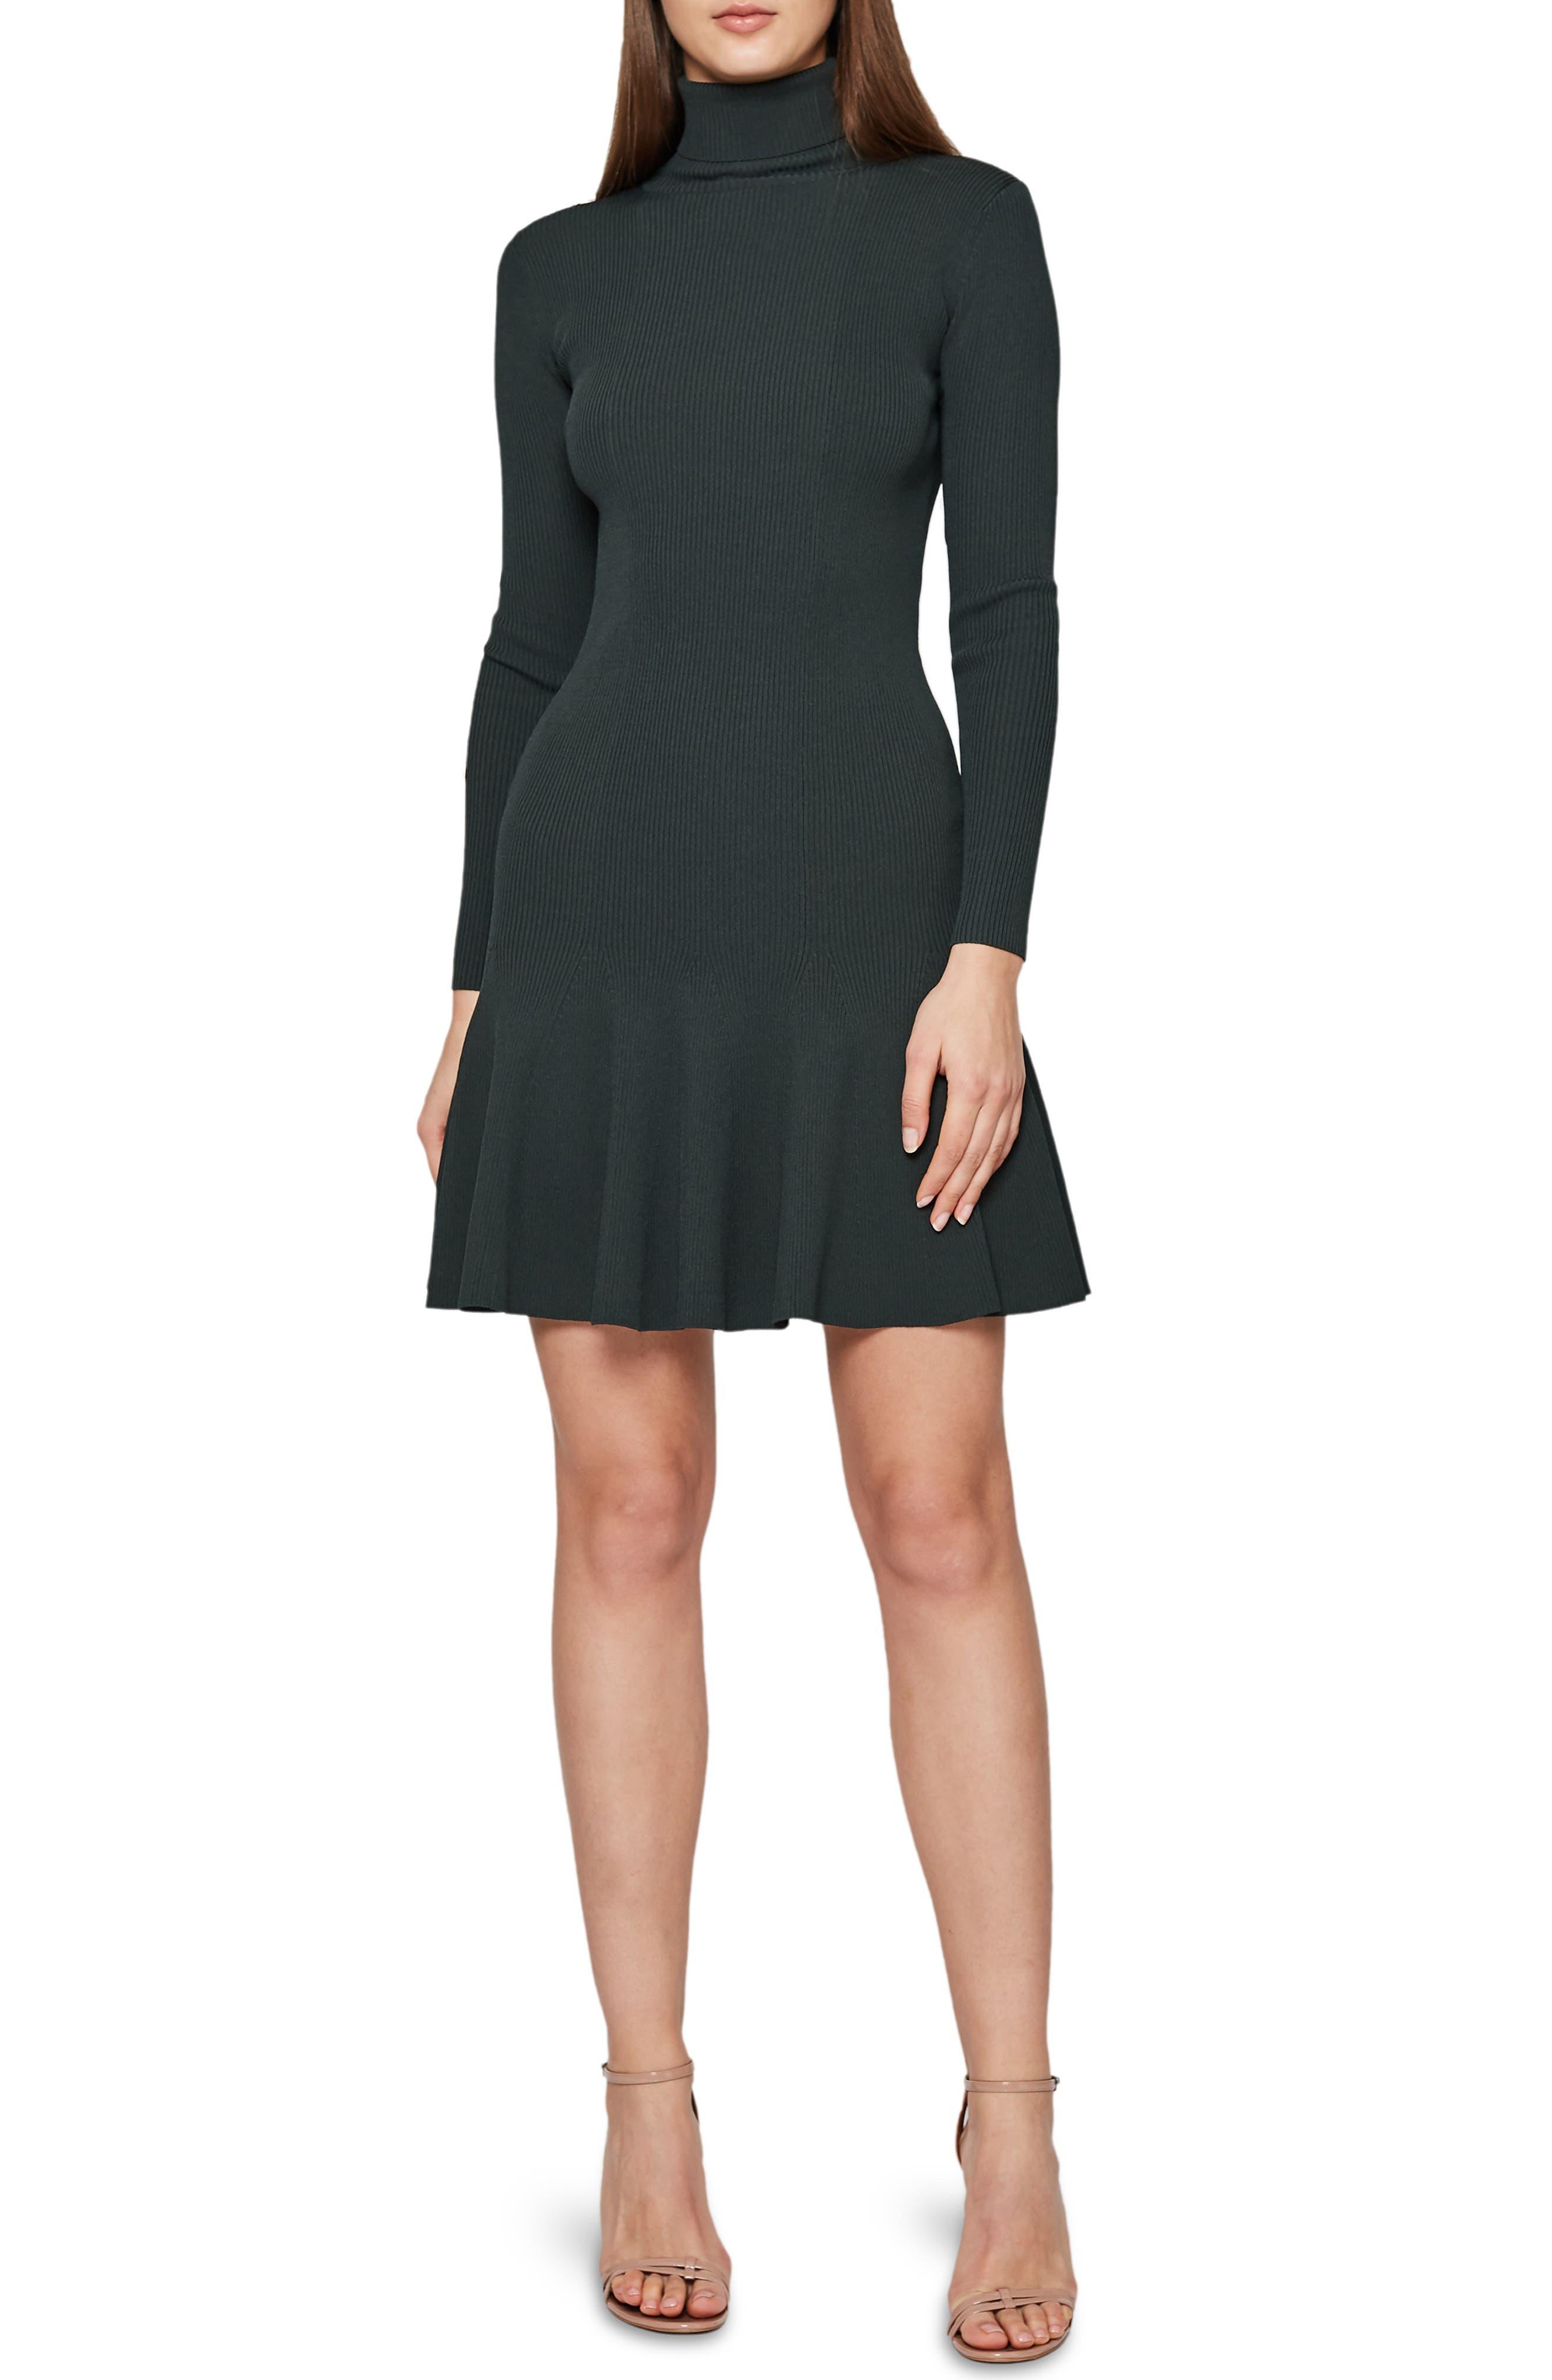 REISS,                             Mimi Turtleneck Sweater Dress,                             Main thumbnail 1, color,                             GREEN